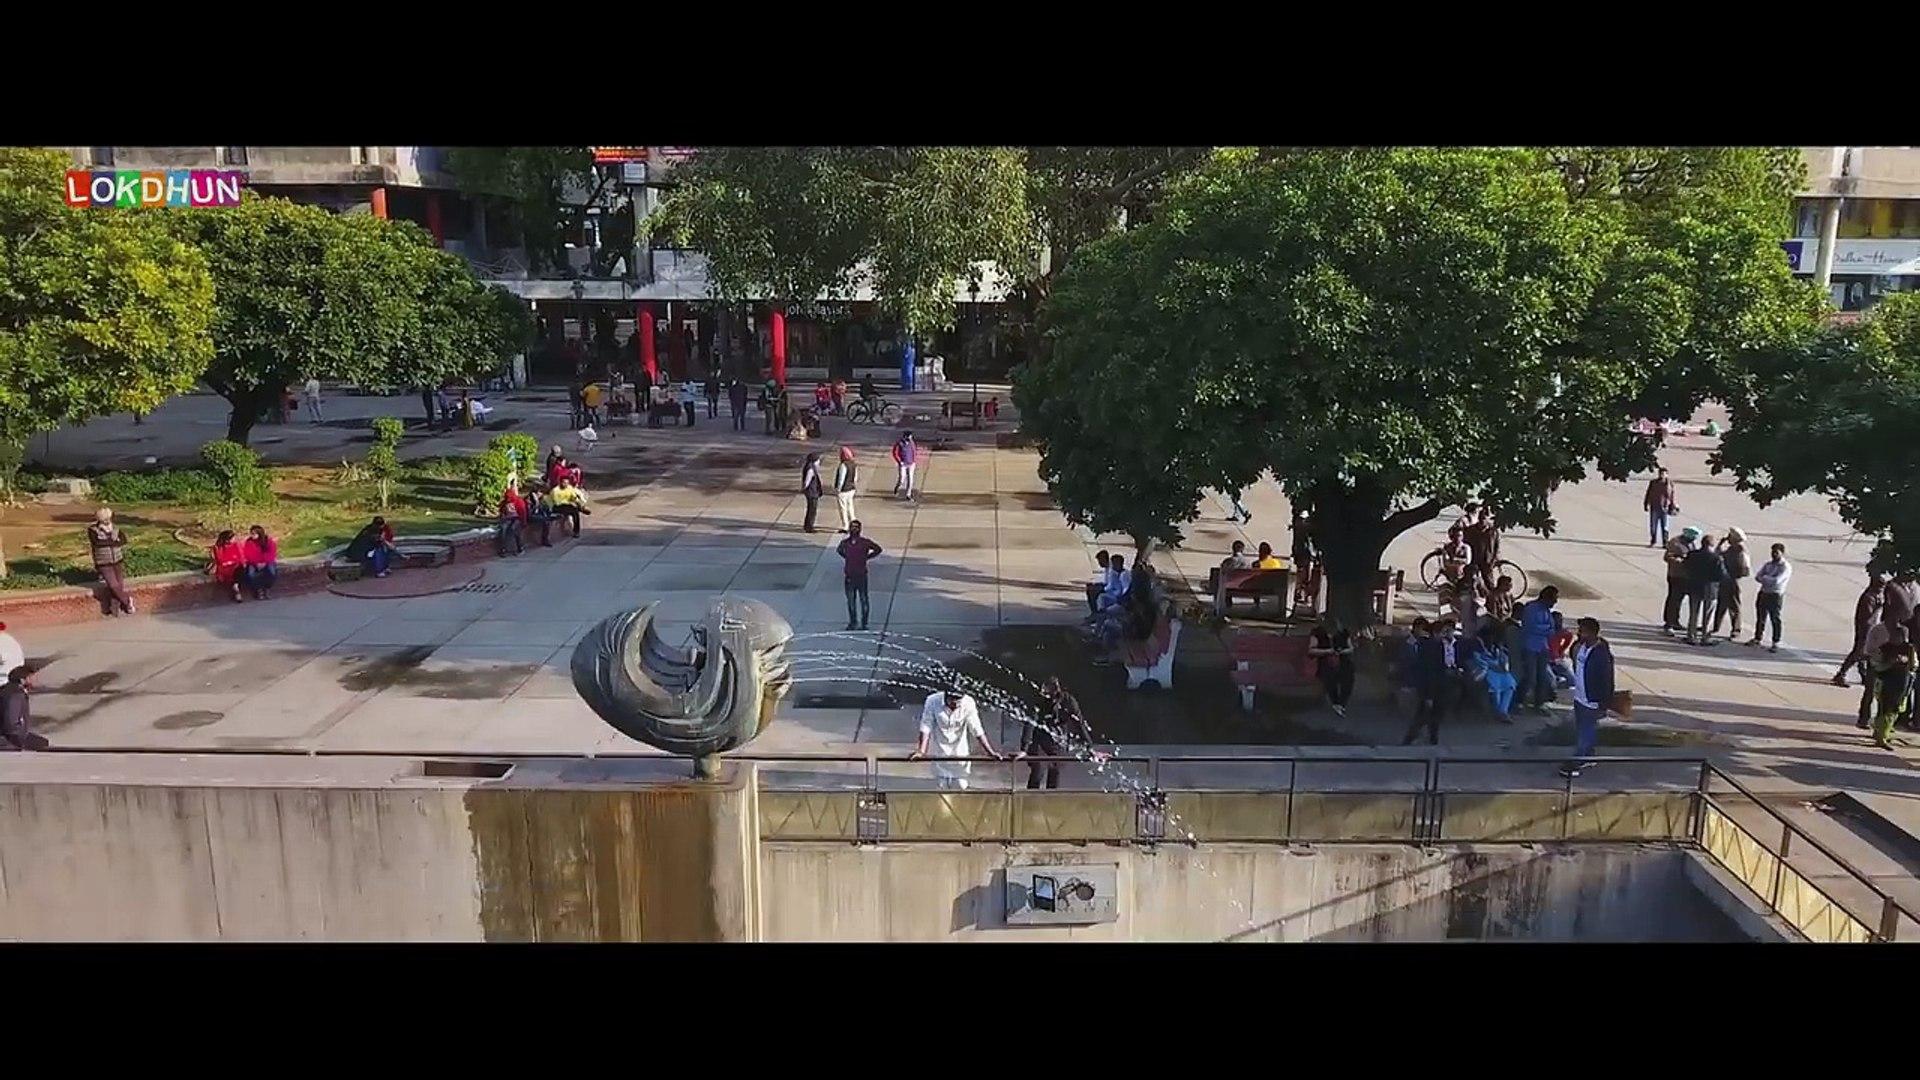 32.BAPU DE KILLE 40 - Geeta Zaildar _ KANDE _ New Punjabi Songs 2018 _ Lokdhun, Punjabi, new punjabi